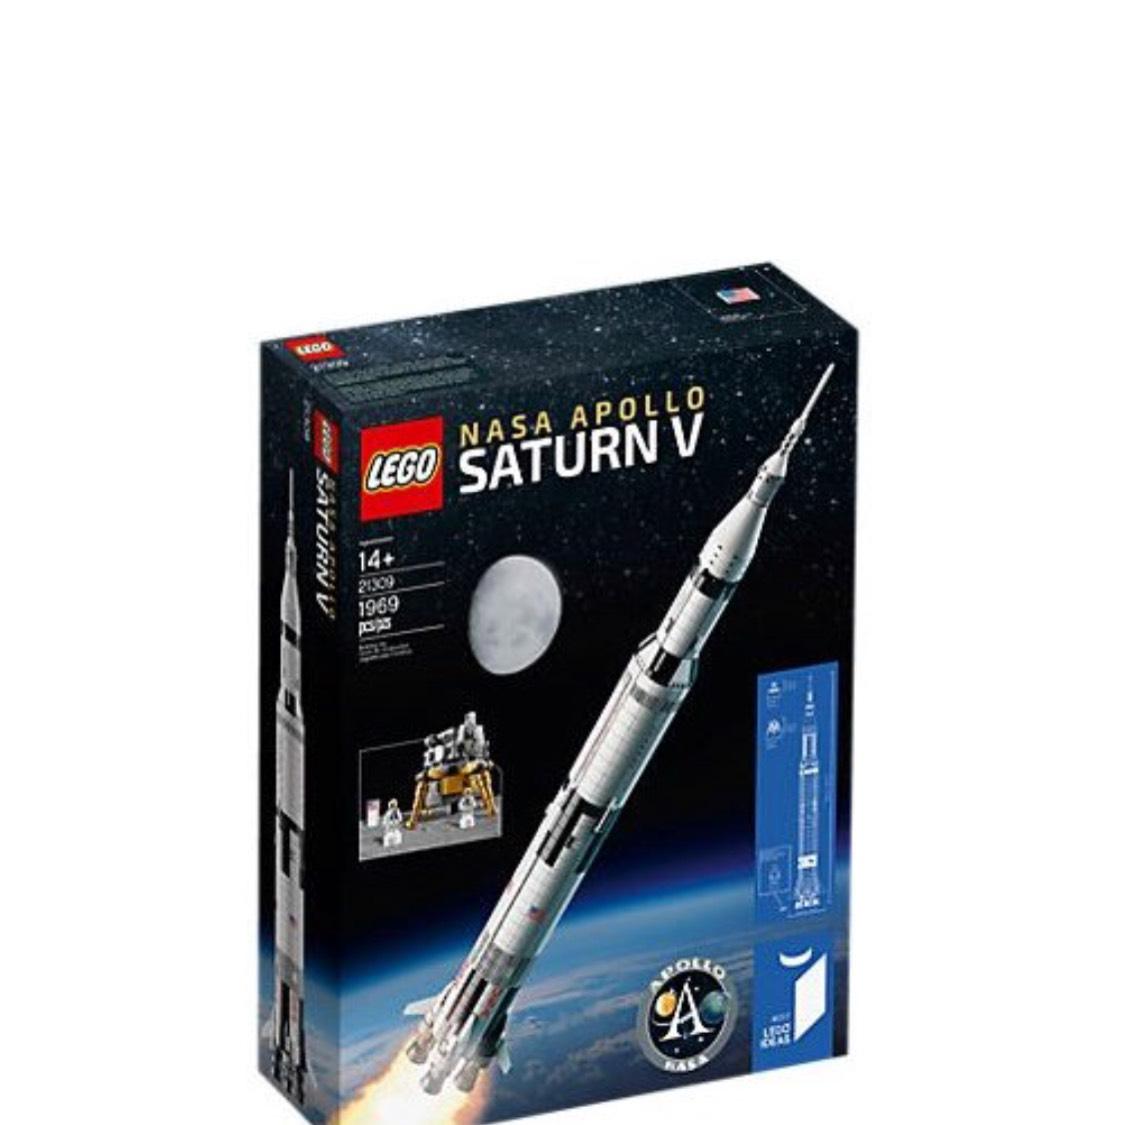 Lego NASA Apollo Saturn V Lokal Friedberg Toys R us